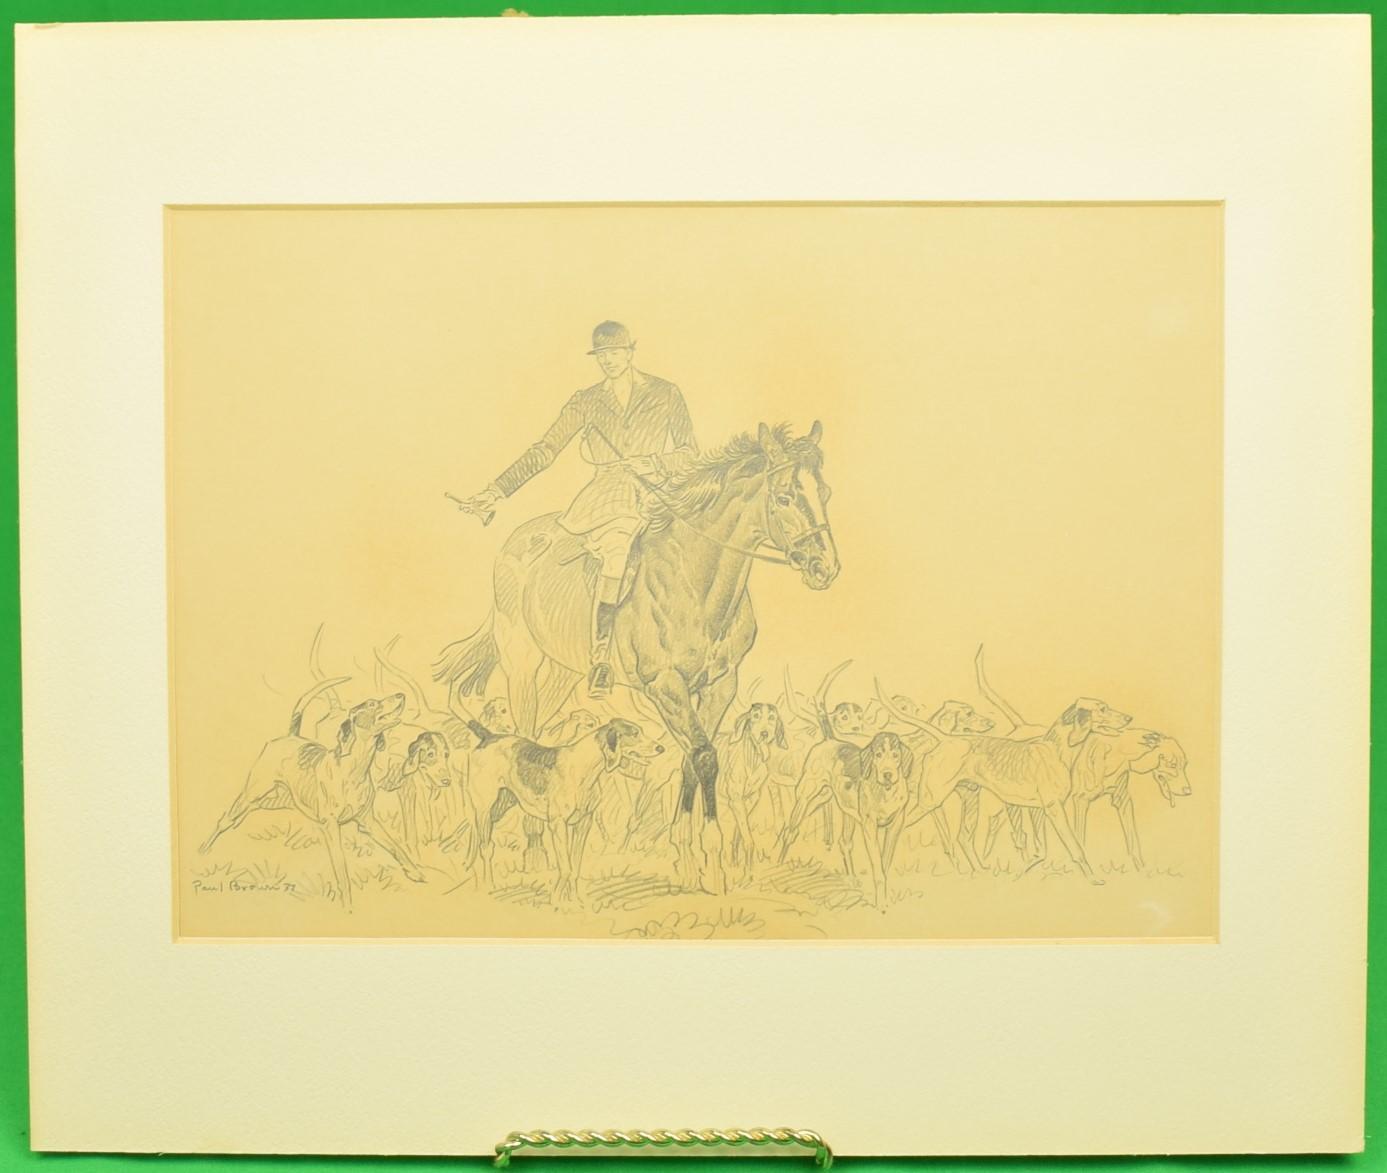 Paul Brown Original c1937 Pencil Drawing Fox-Hunter & Hounds